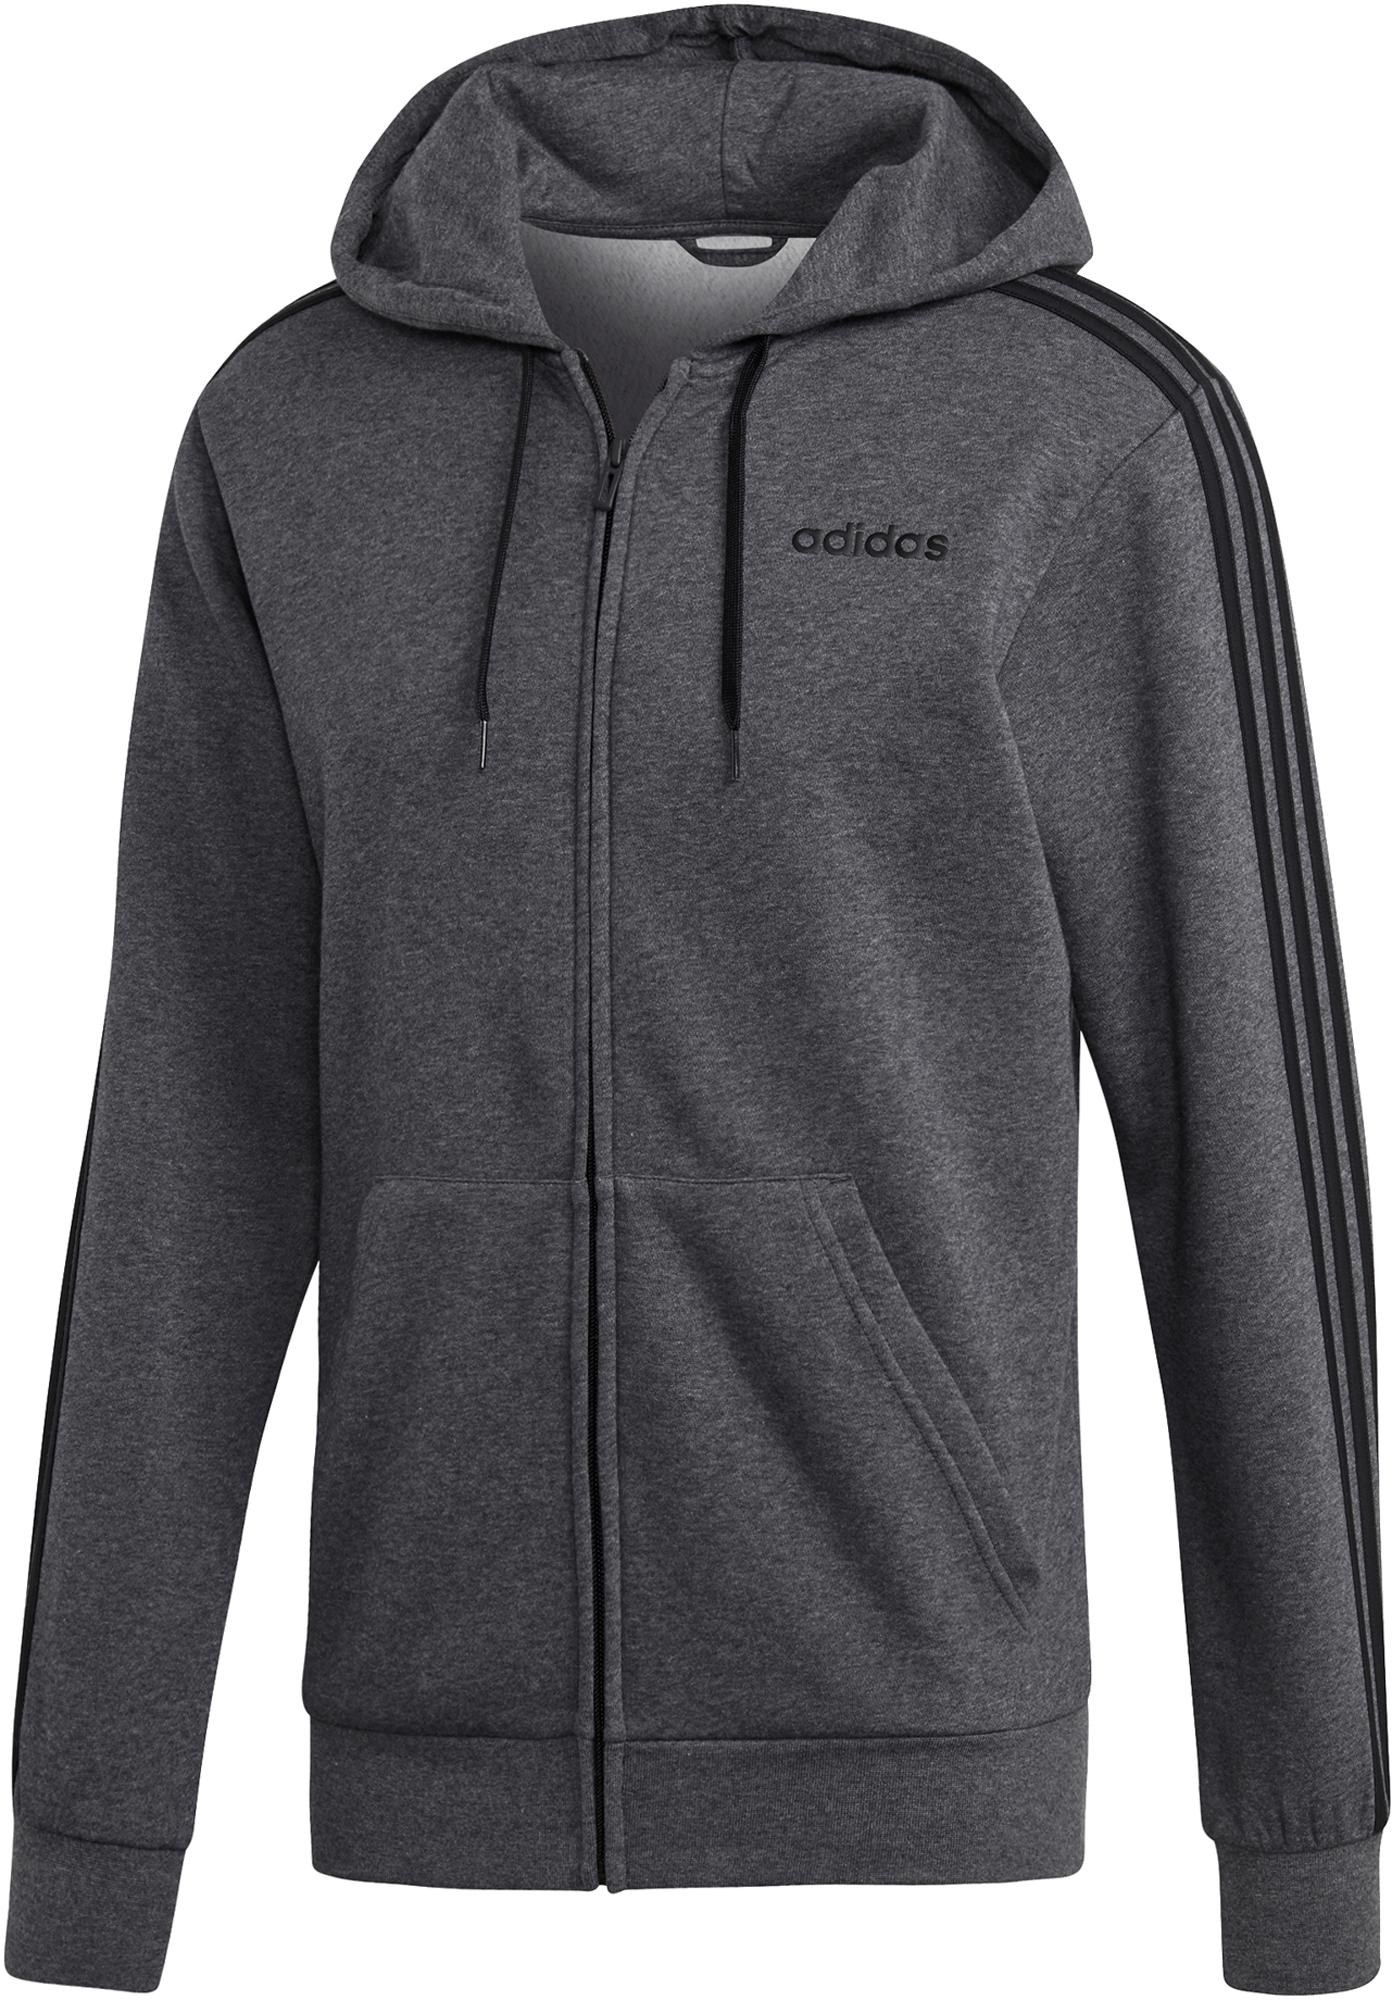 Adidas Толстовка мужская adidas Essentials 3-Stripes, размер 44-46 adidas легинсы для девочек adidas essentials 3 stripes размер 128